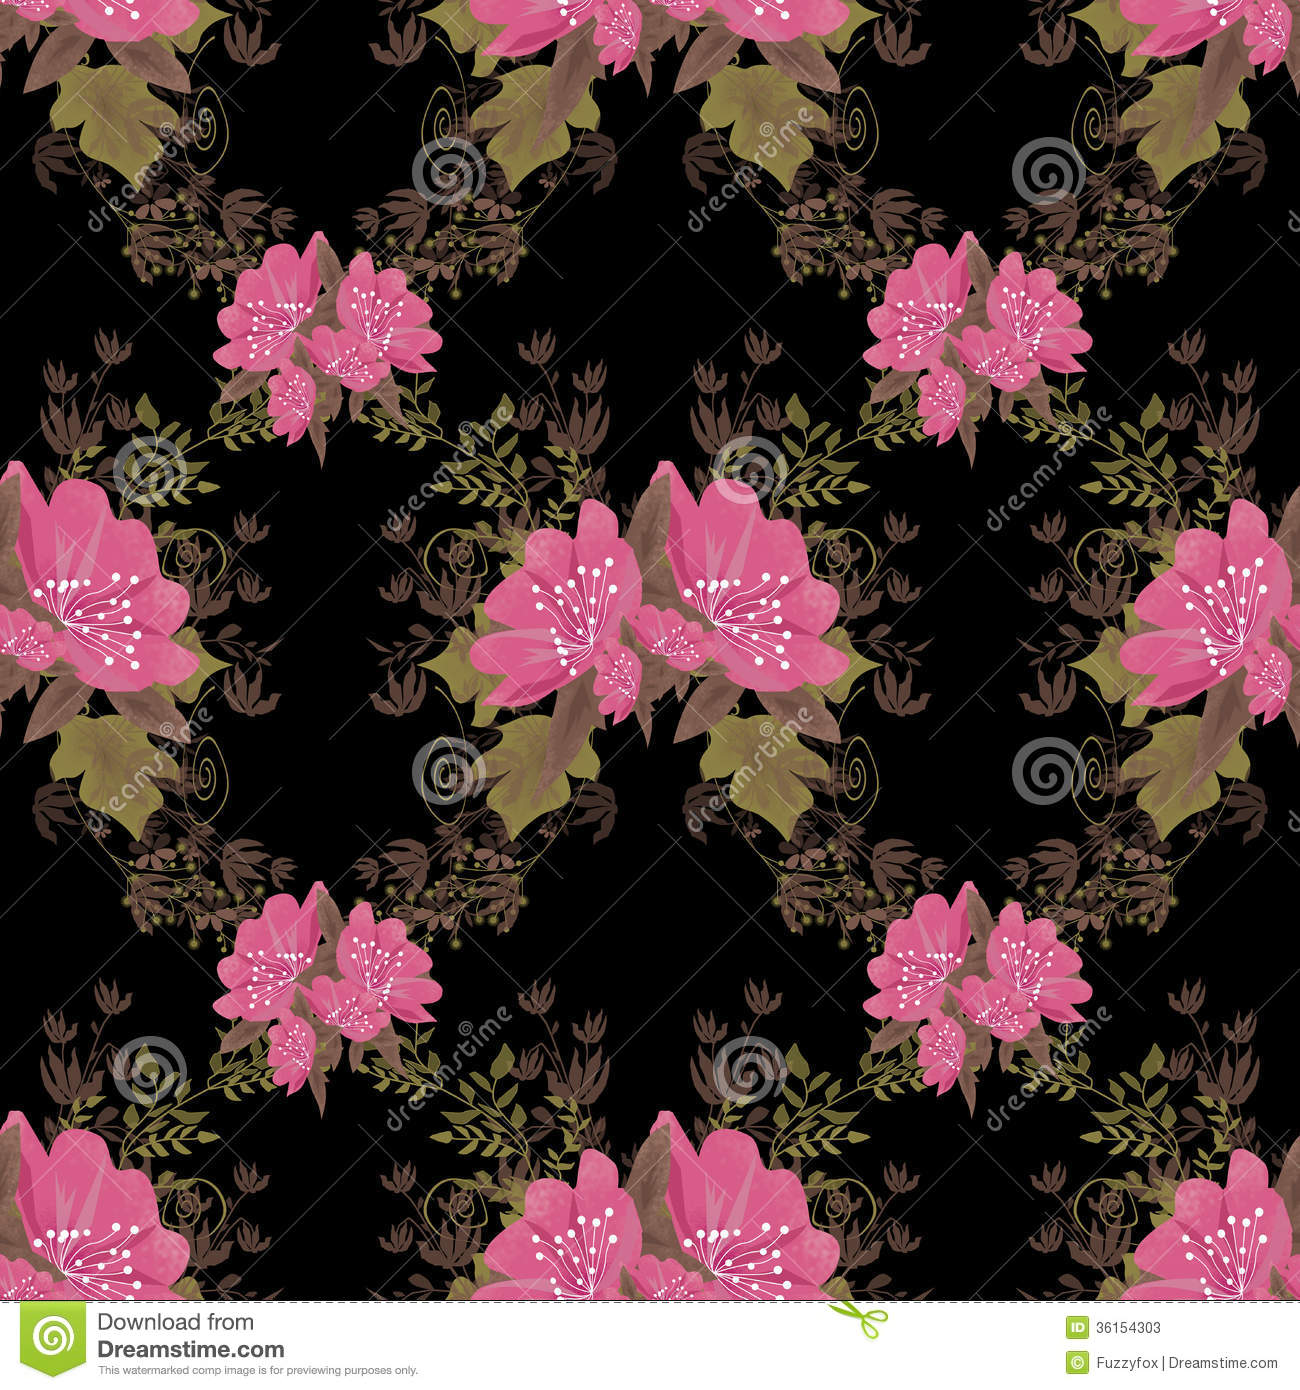 Pink and black flower wallpaper wallpapersafari pink and black flower backgrounds with pink flowers on black dhlflorist Choice Image